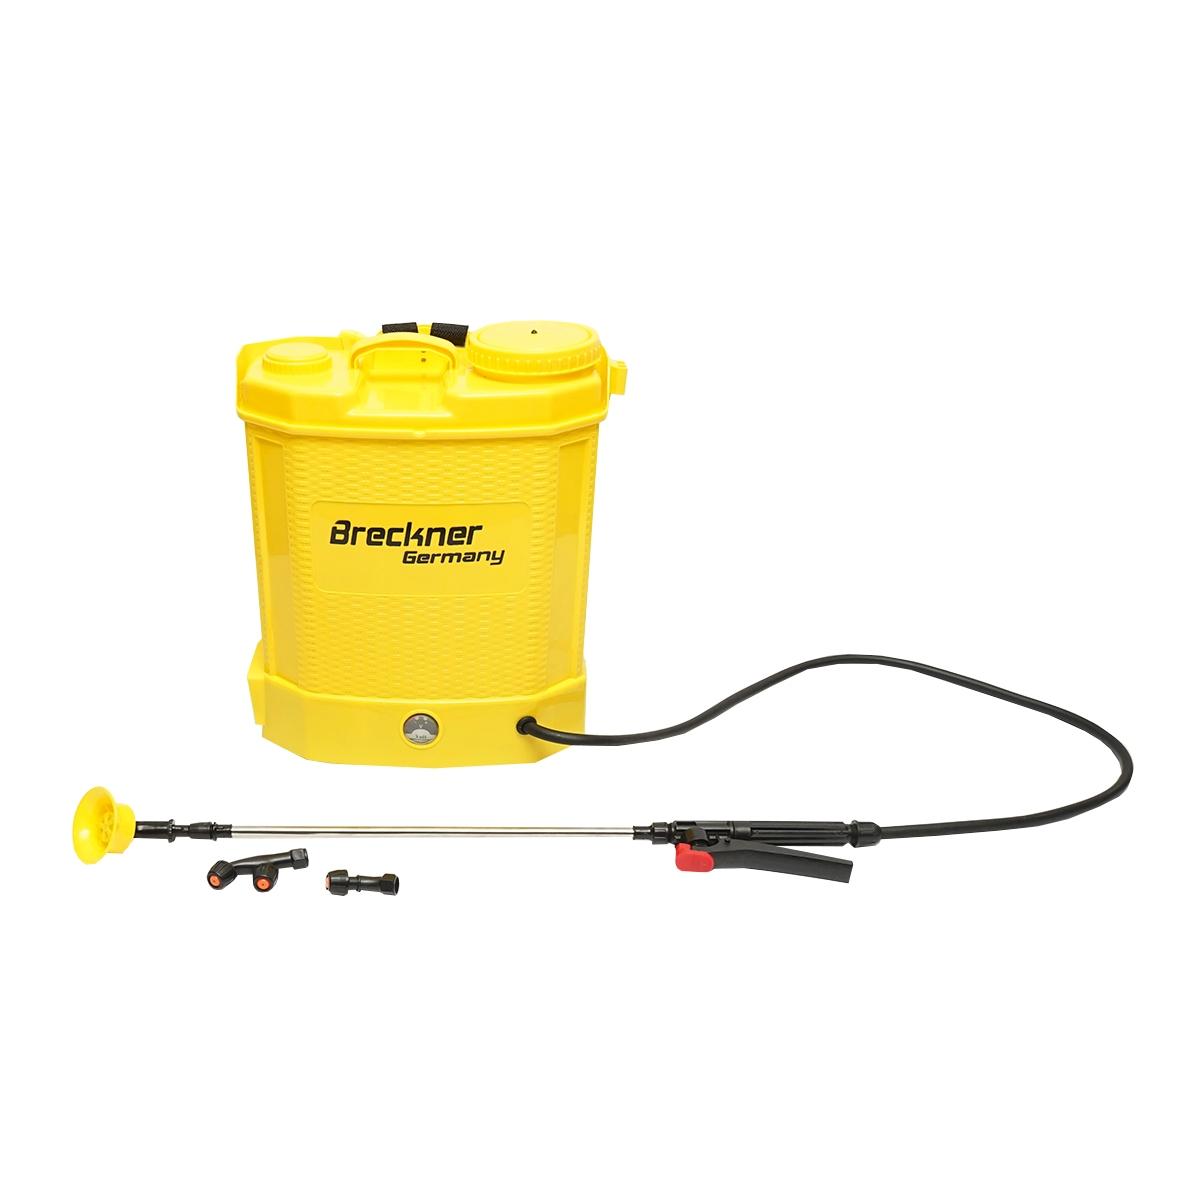 Pompa electrica/pulverizator de stropit vermorel, rezervor 12L baterie 12V 8Ah debit 3.1 l/min Breckner Germany